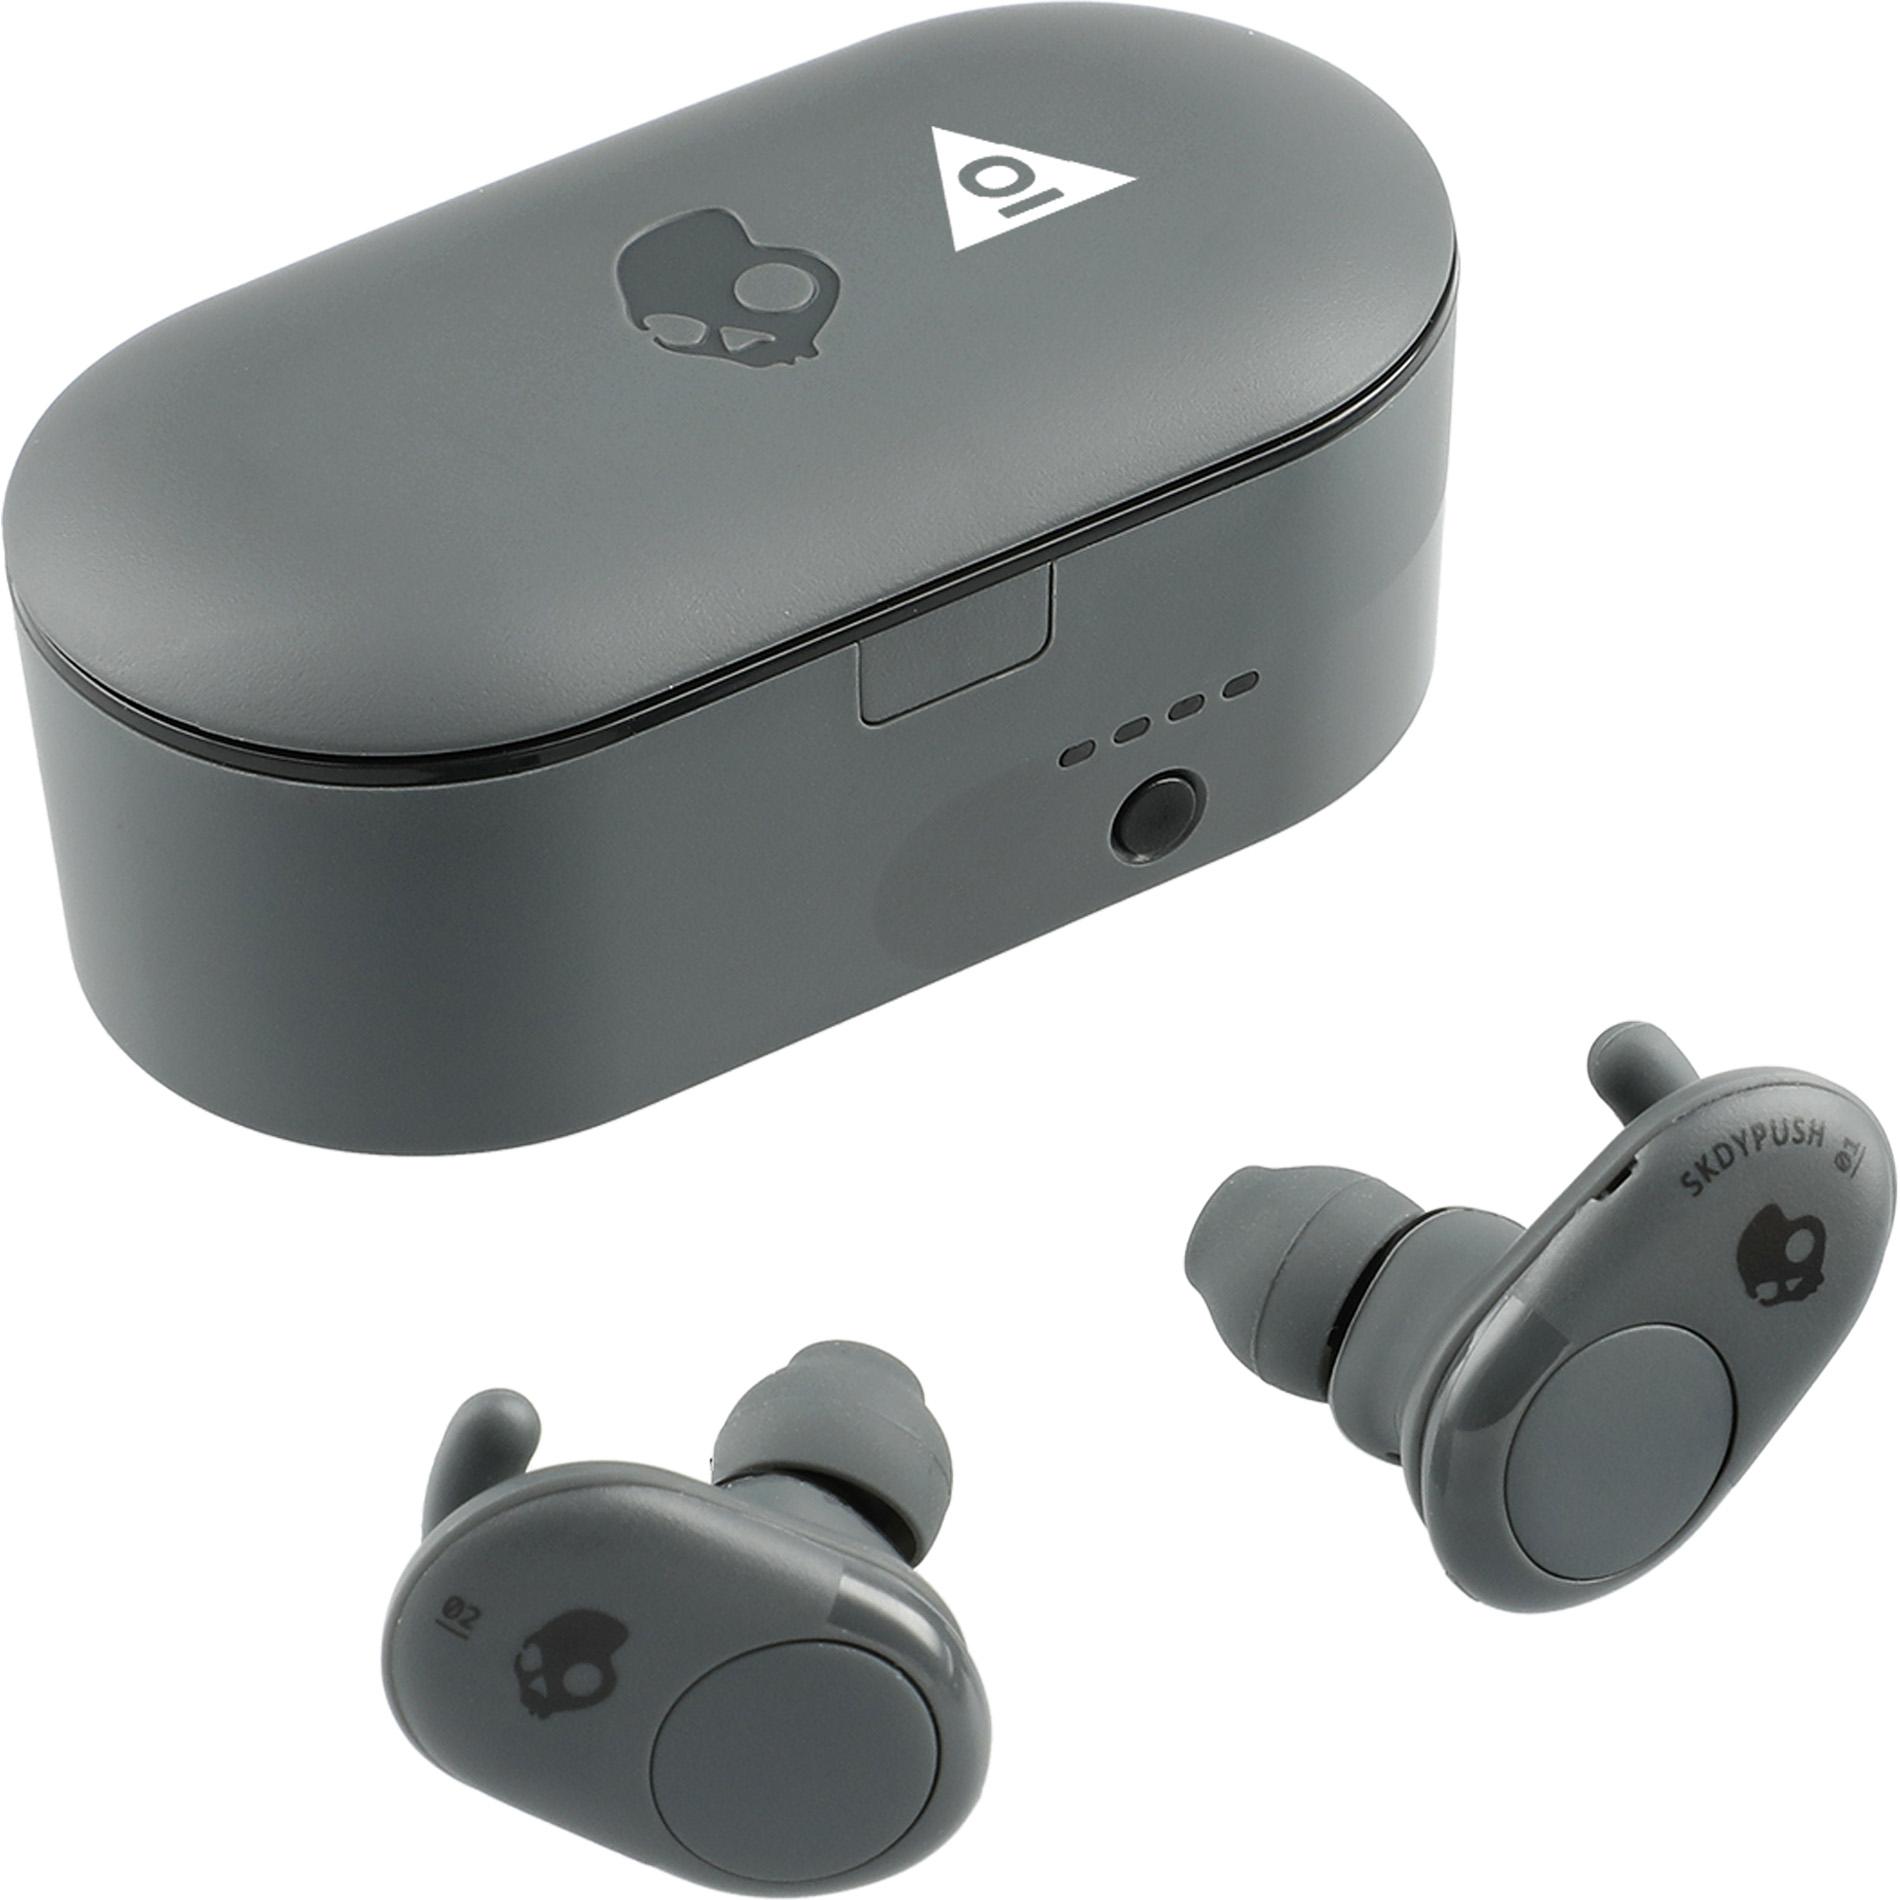 Skullcandy Push True Wireless Bluetooth Earbuds, 7196-08-L, 1 Colour Imprint